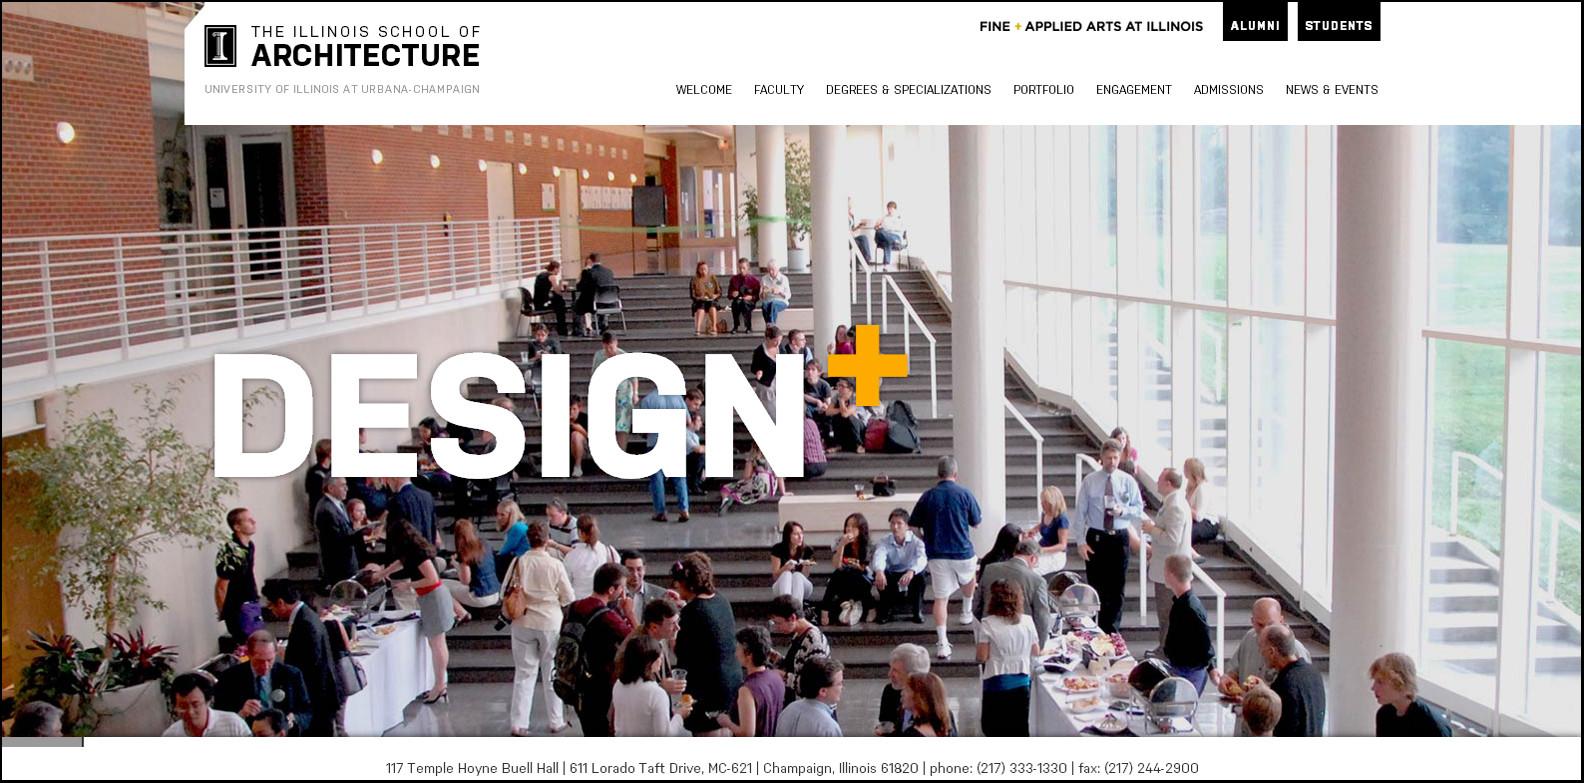 The Illinois School of Architecture Announces New Website